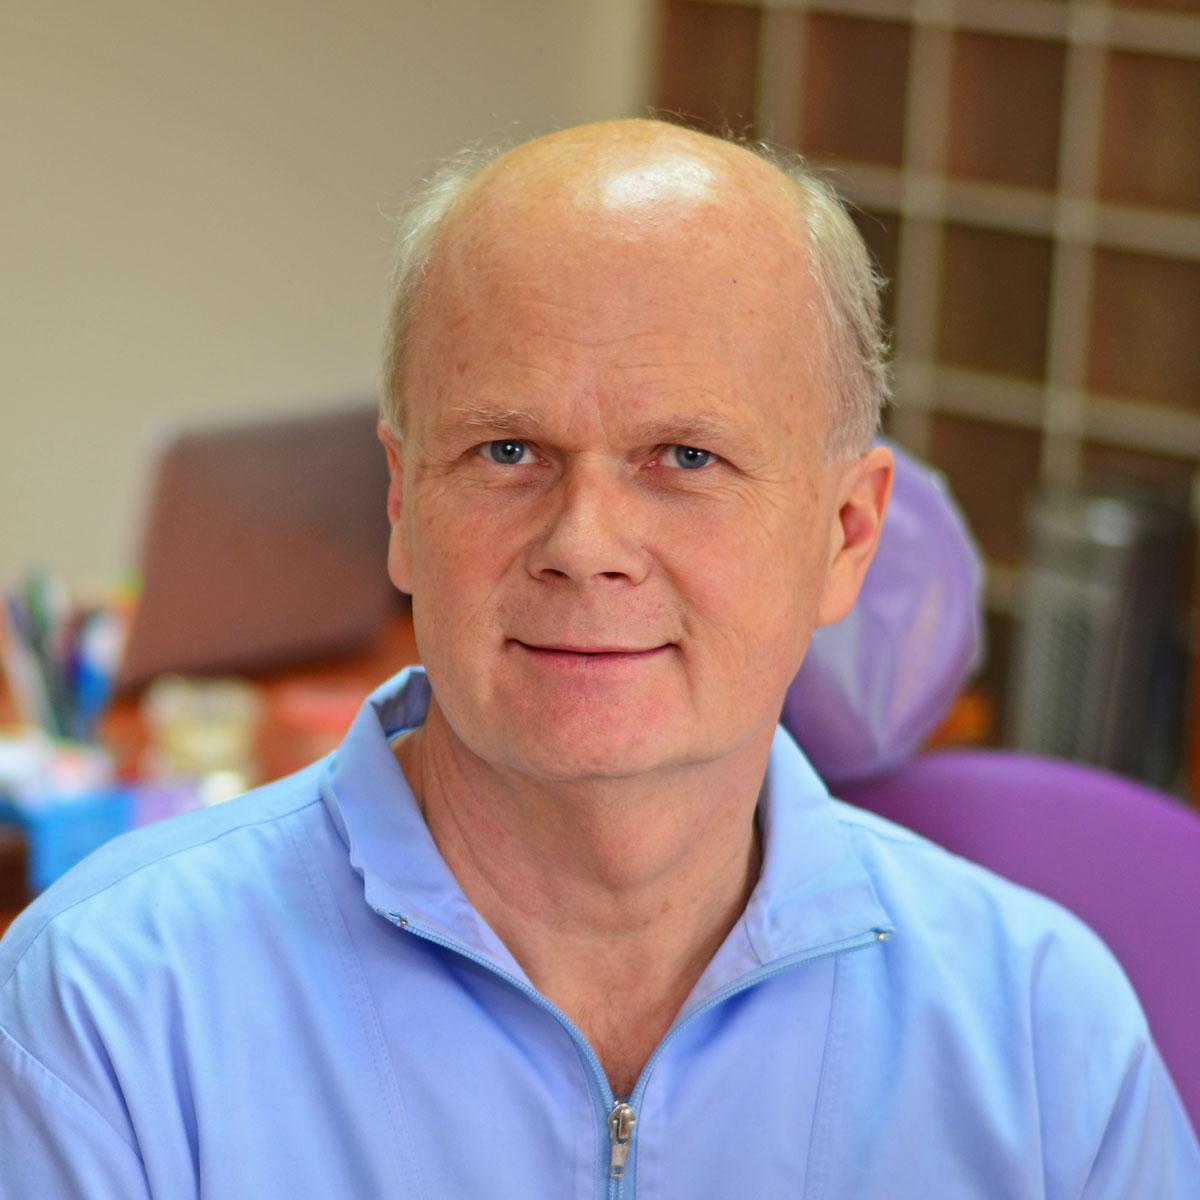 dr n. med. Dariusz Maciej Jabłoński